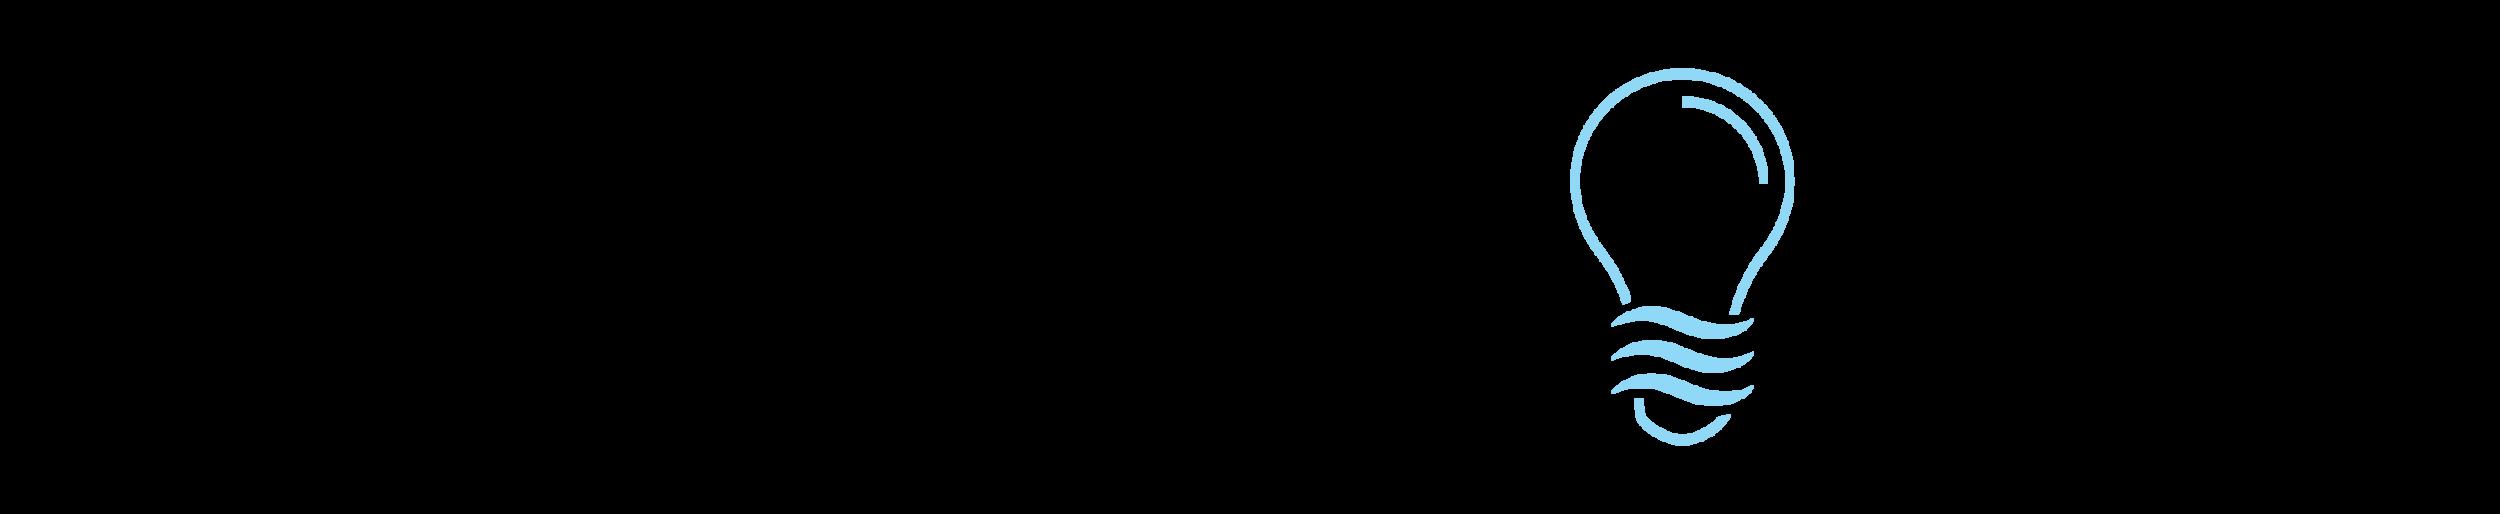 Innovators_logo.png